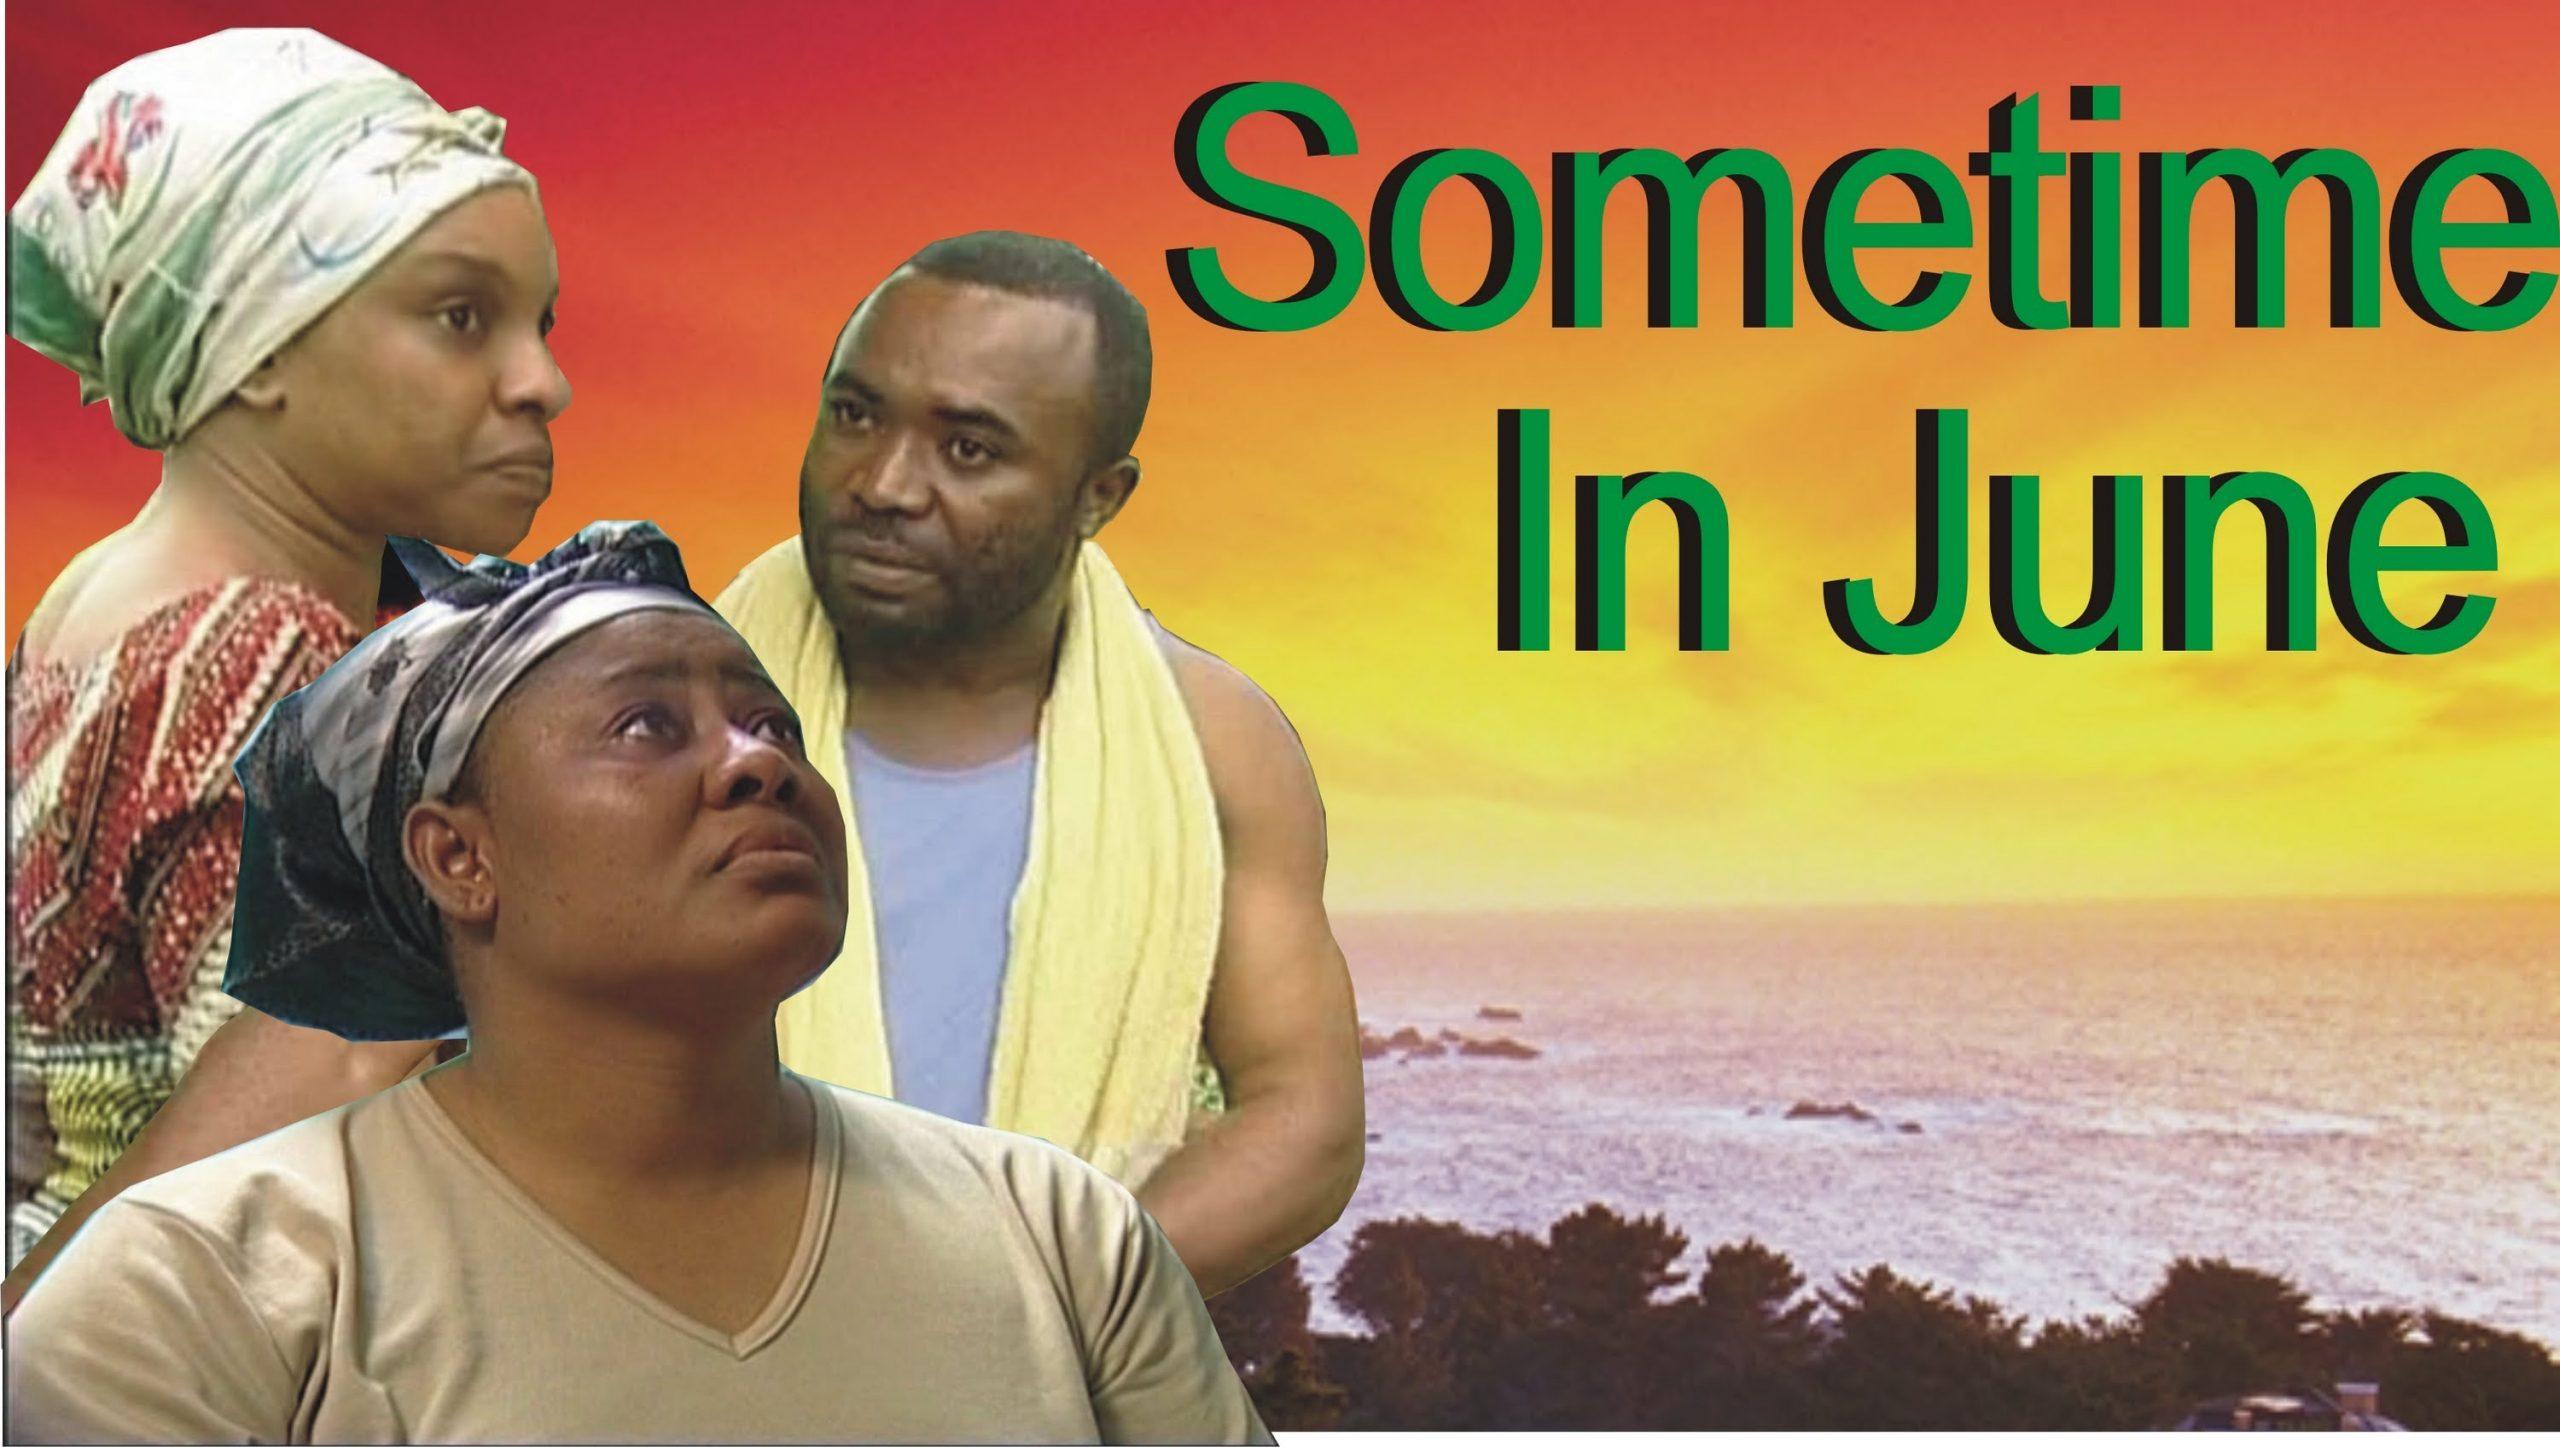 AFRICAN MOVIE SOMETIME IN JUNE